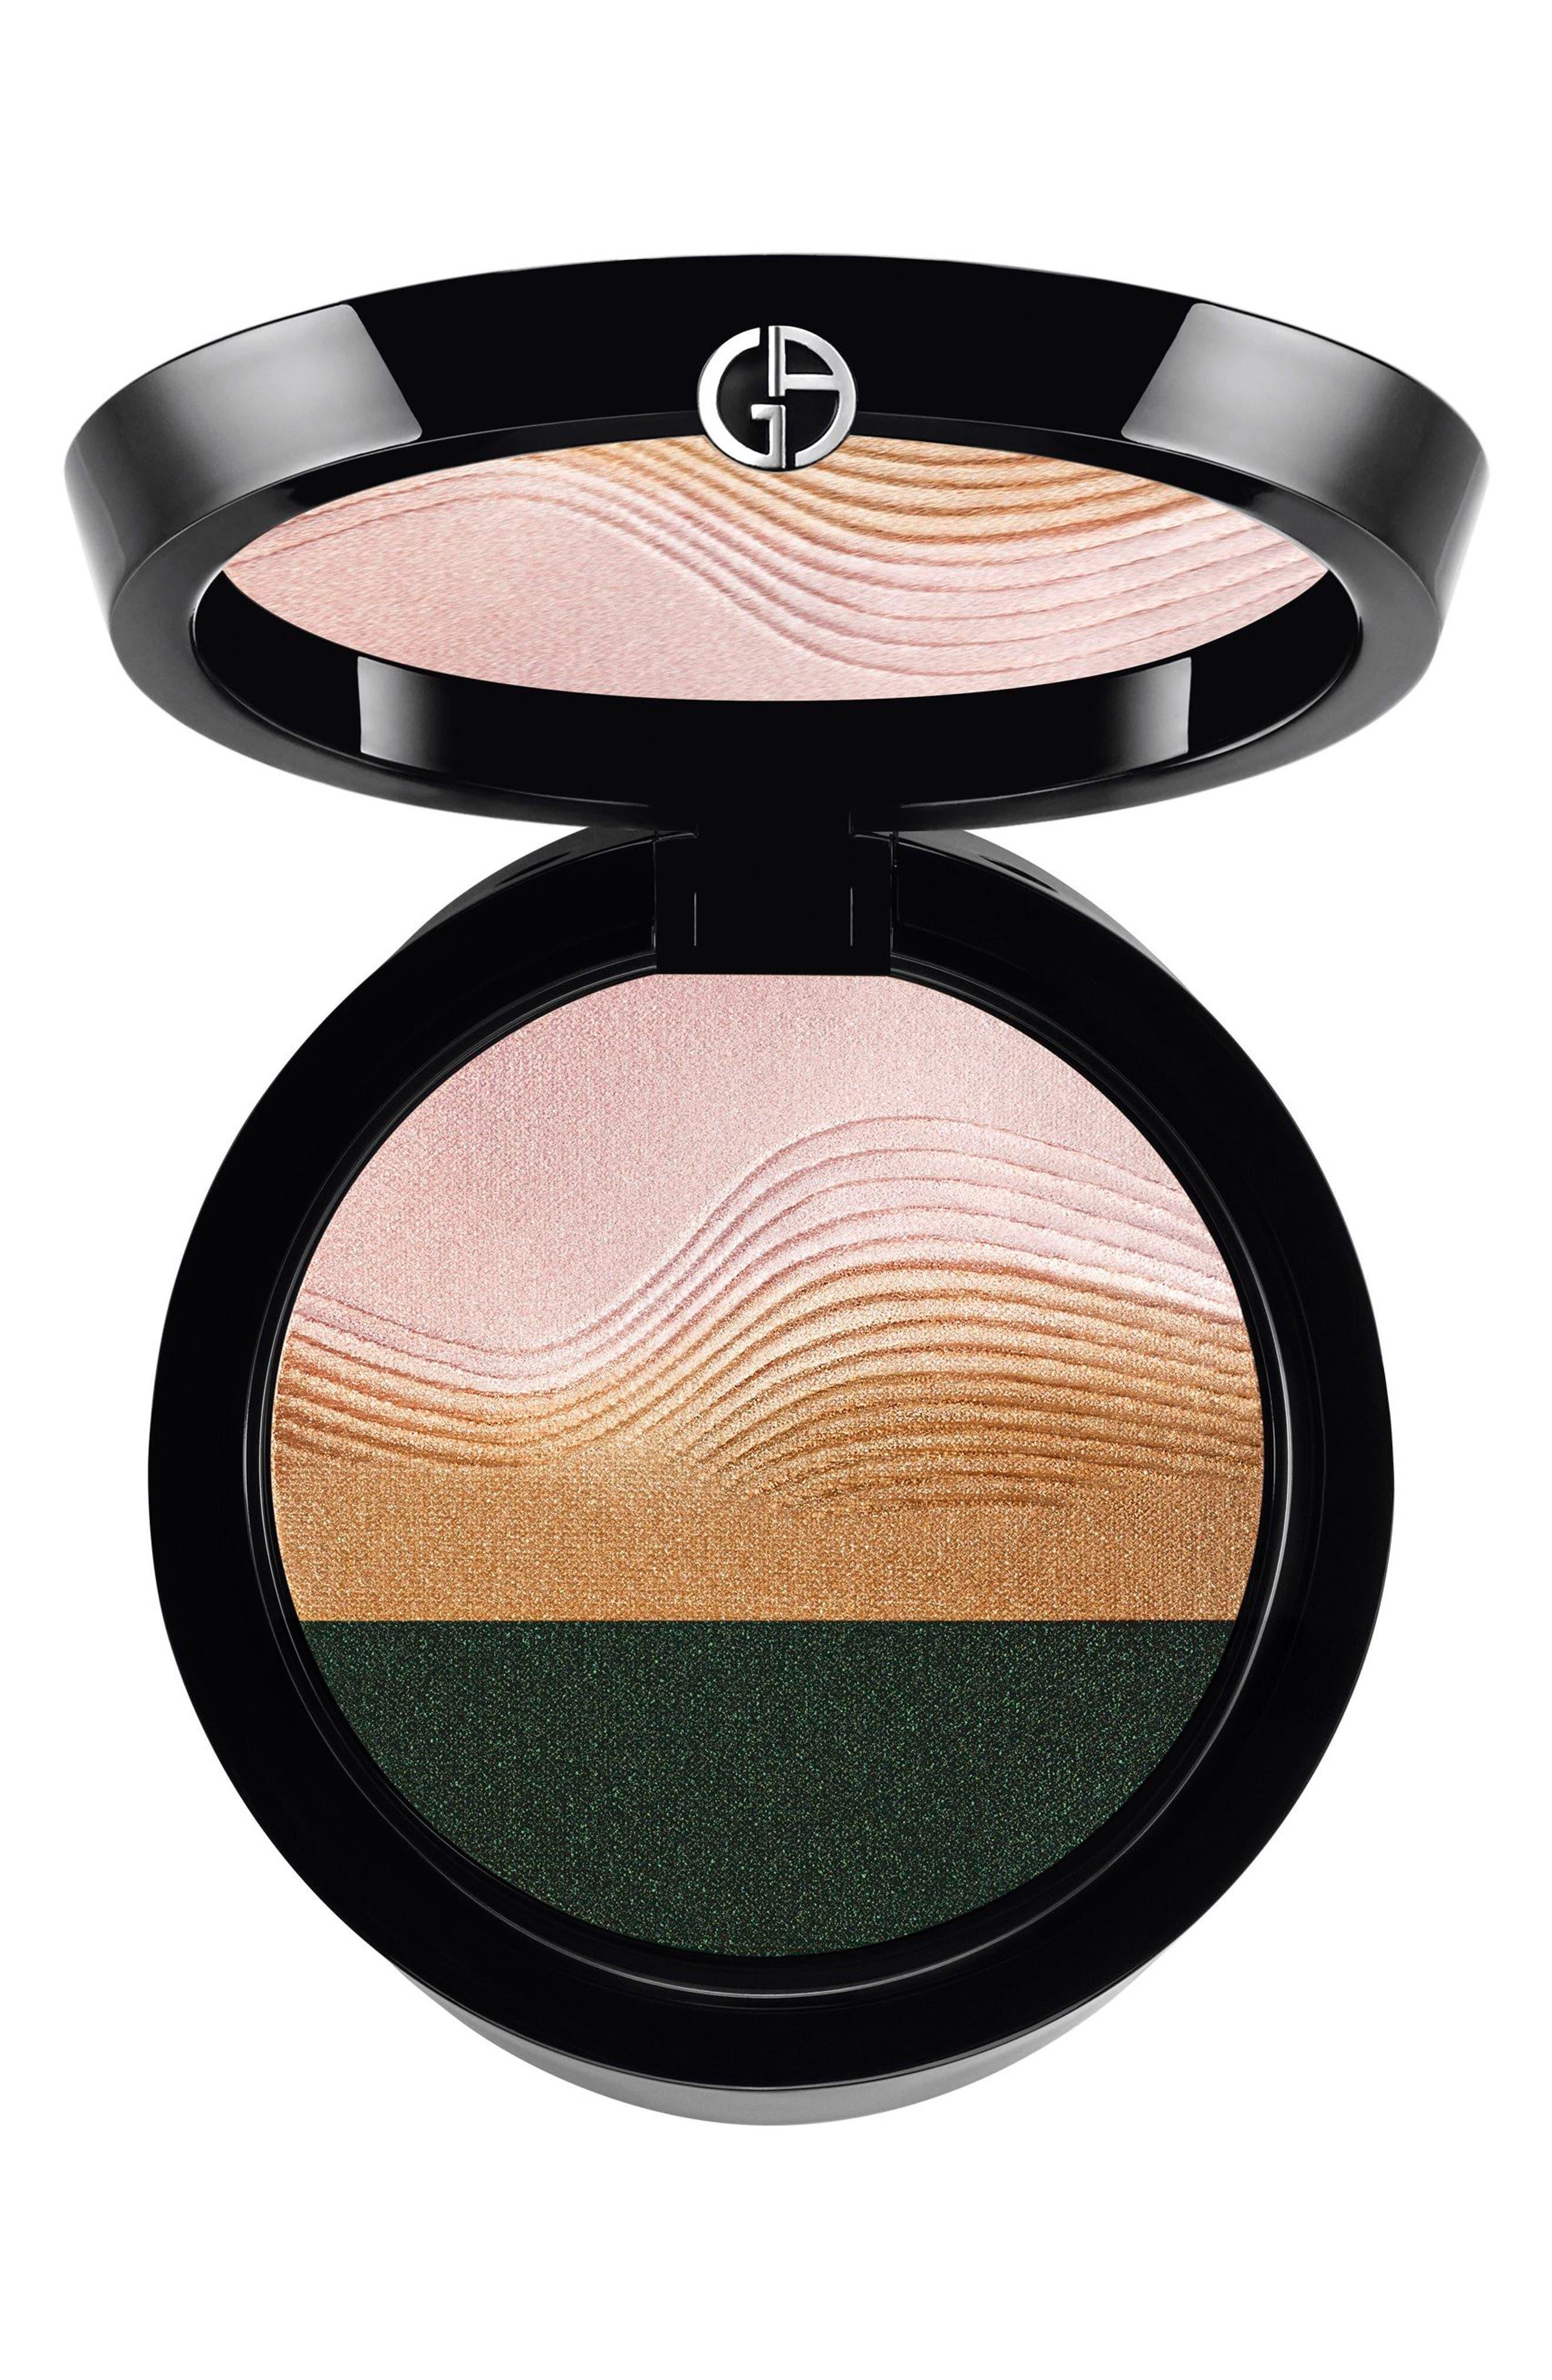 Giorgio Armani Life is a Cruise Sunset Eye Palette